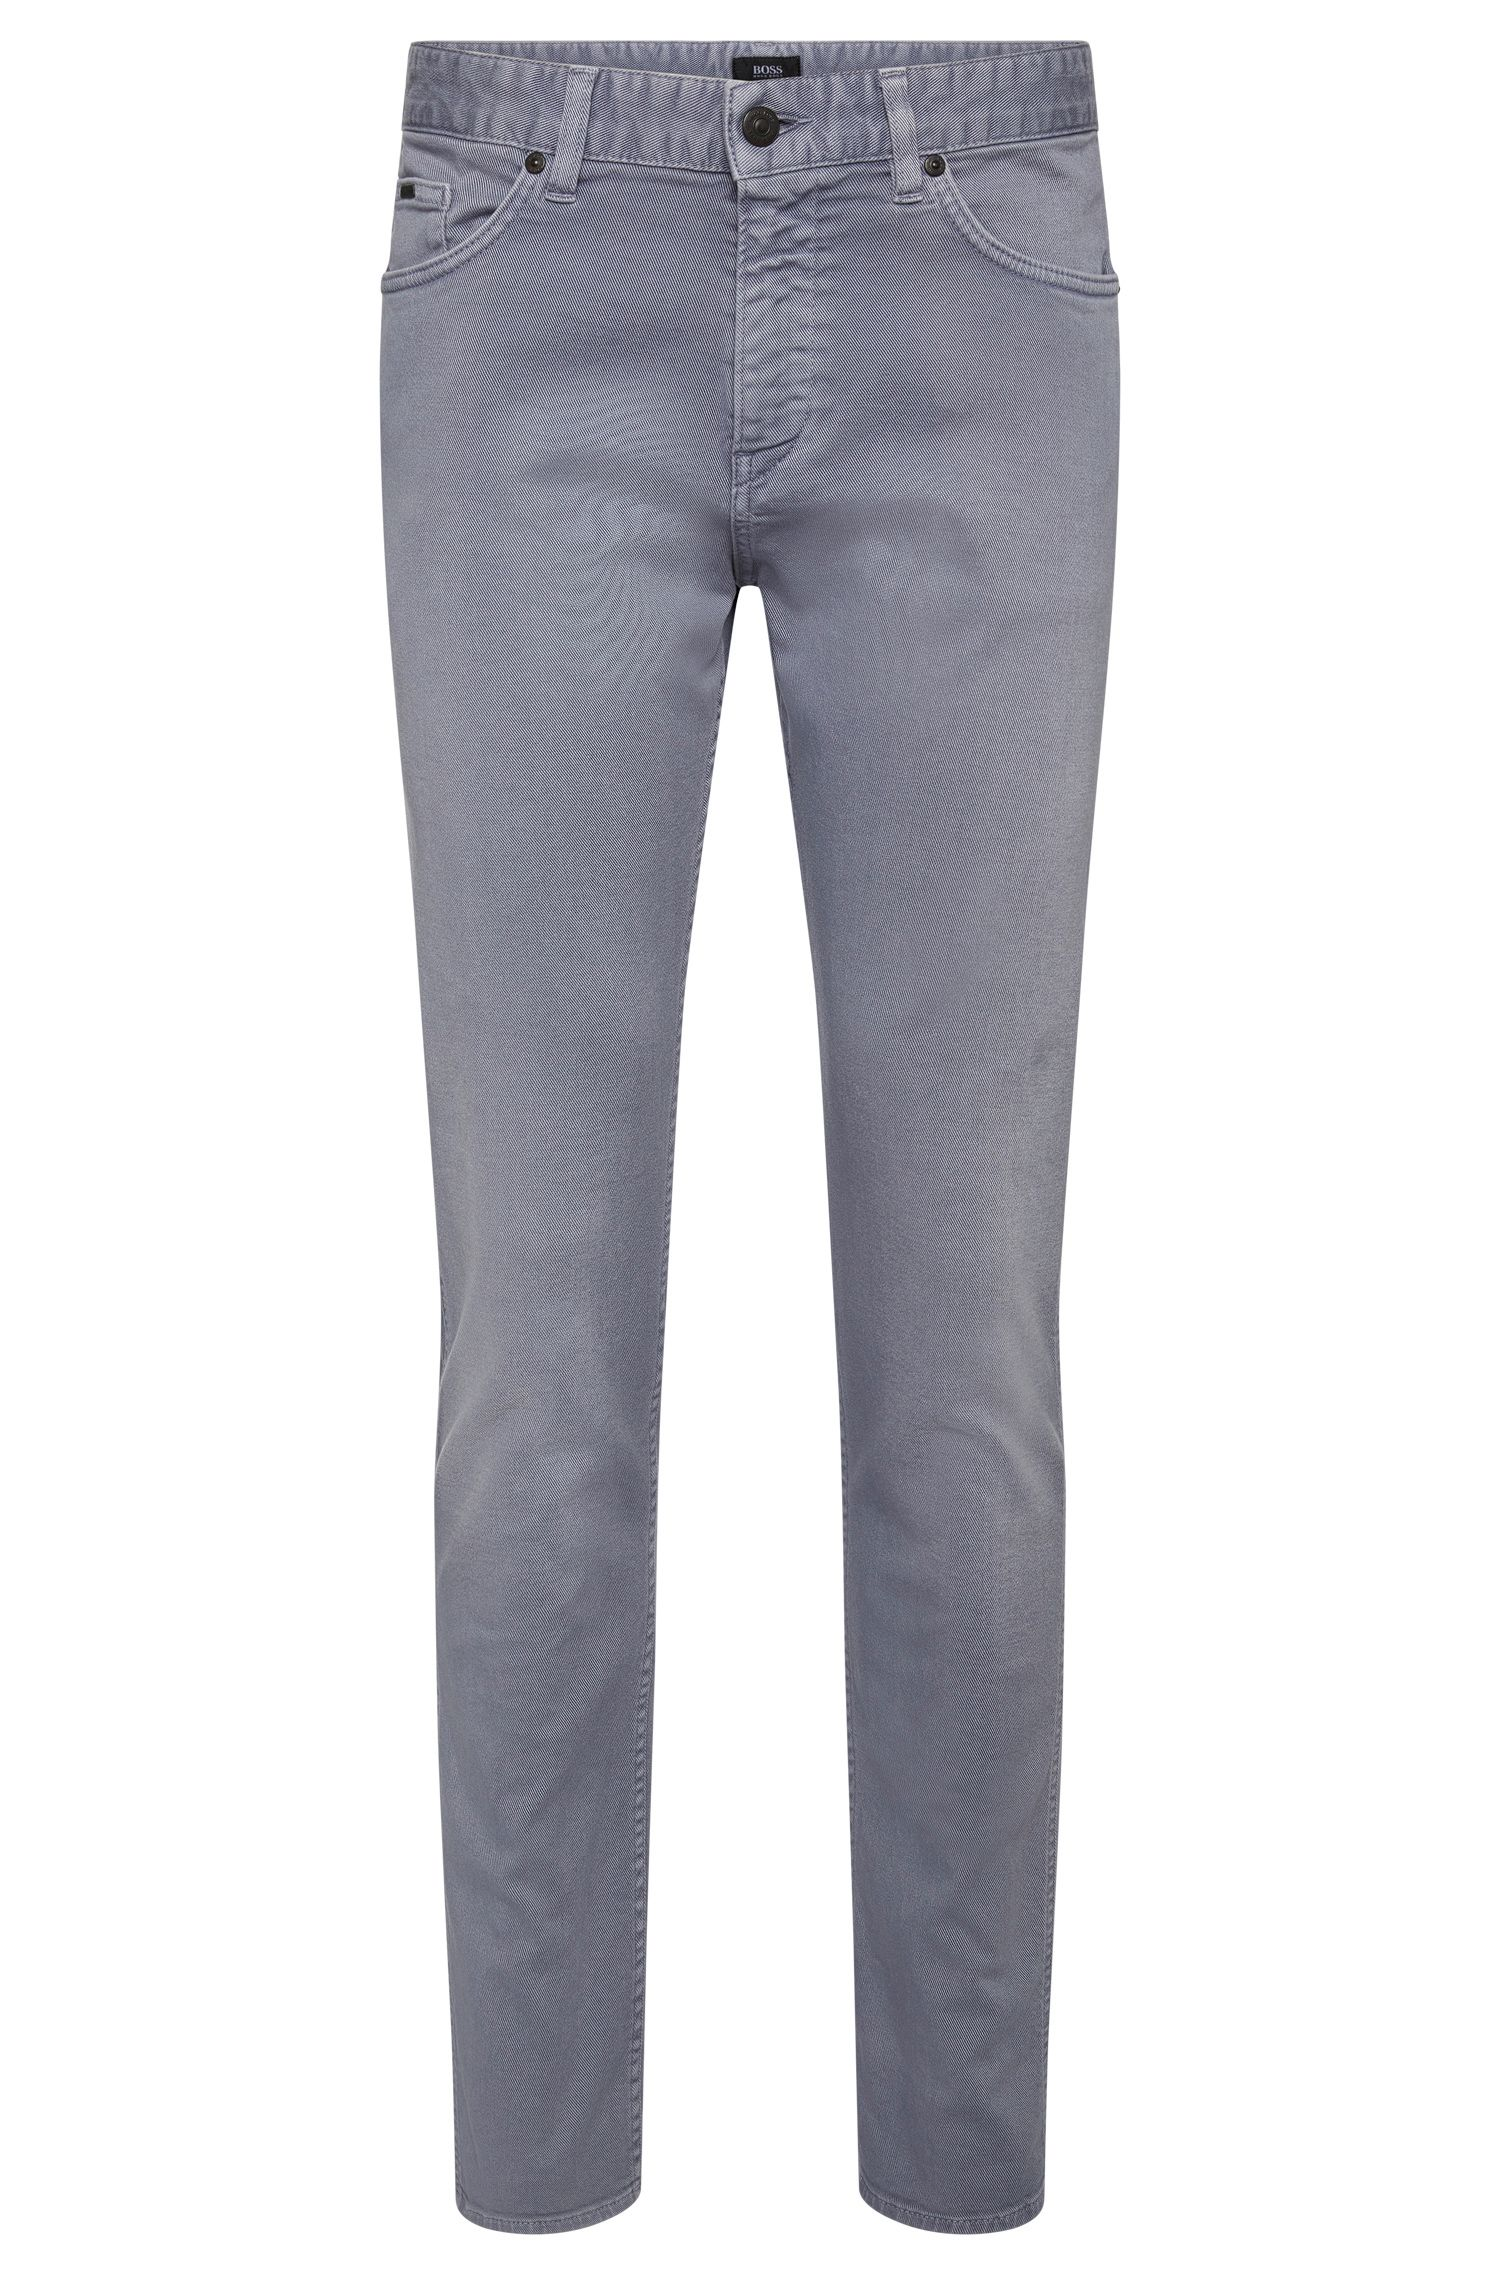 8.5 oz Stretch Cotton Blend Jeans, Slim Leg   Delaware